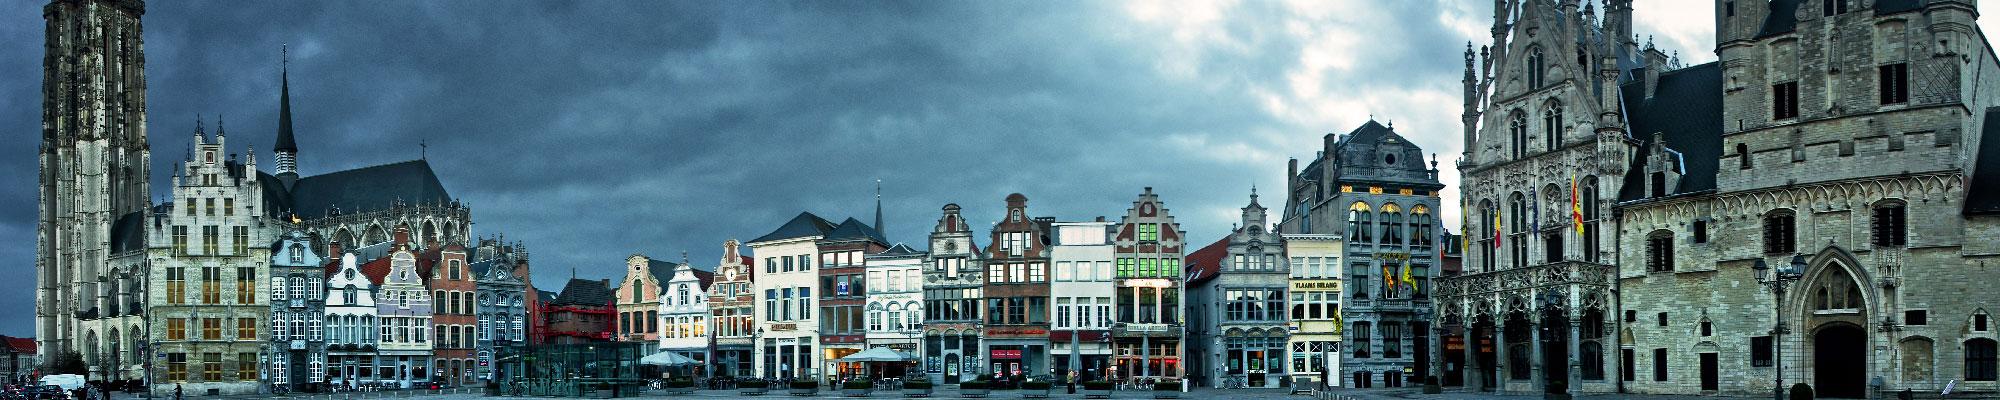 Vrijzinnig Mechelen